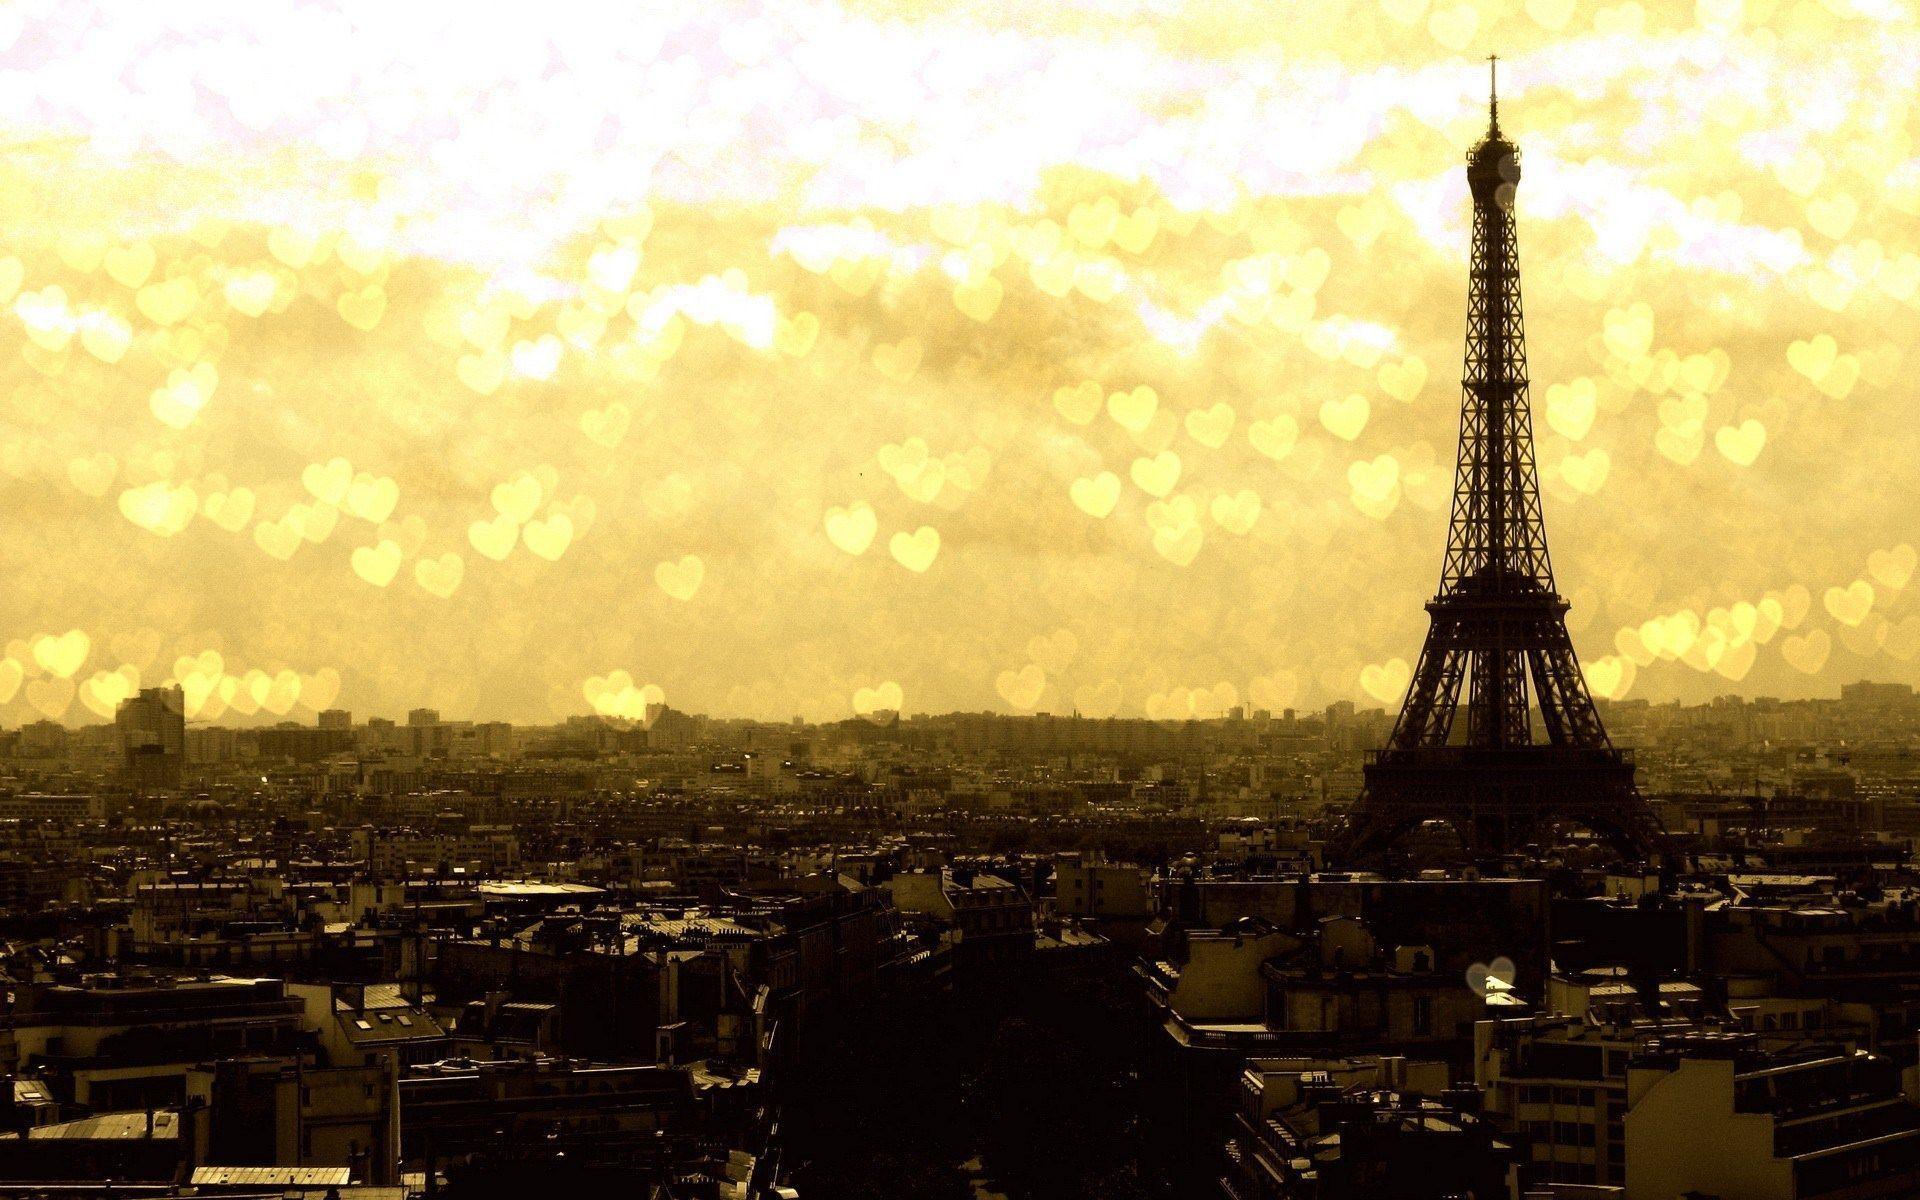 Hd wallpaper paris - Paris City Hd Wallpapers Paris City Desktop Images Cool Wallpapers